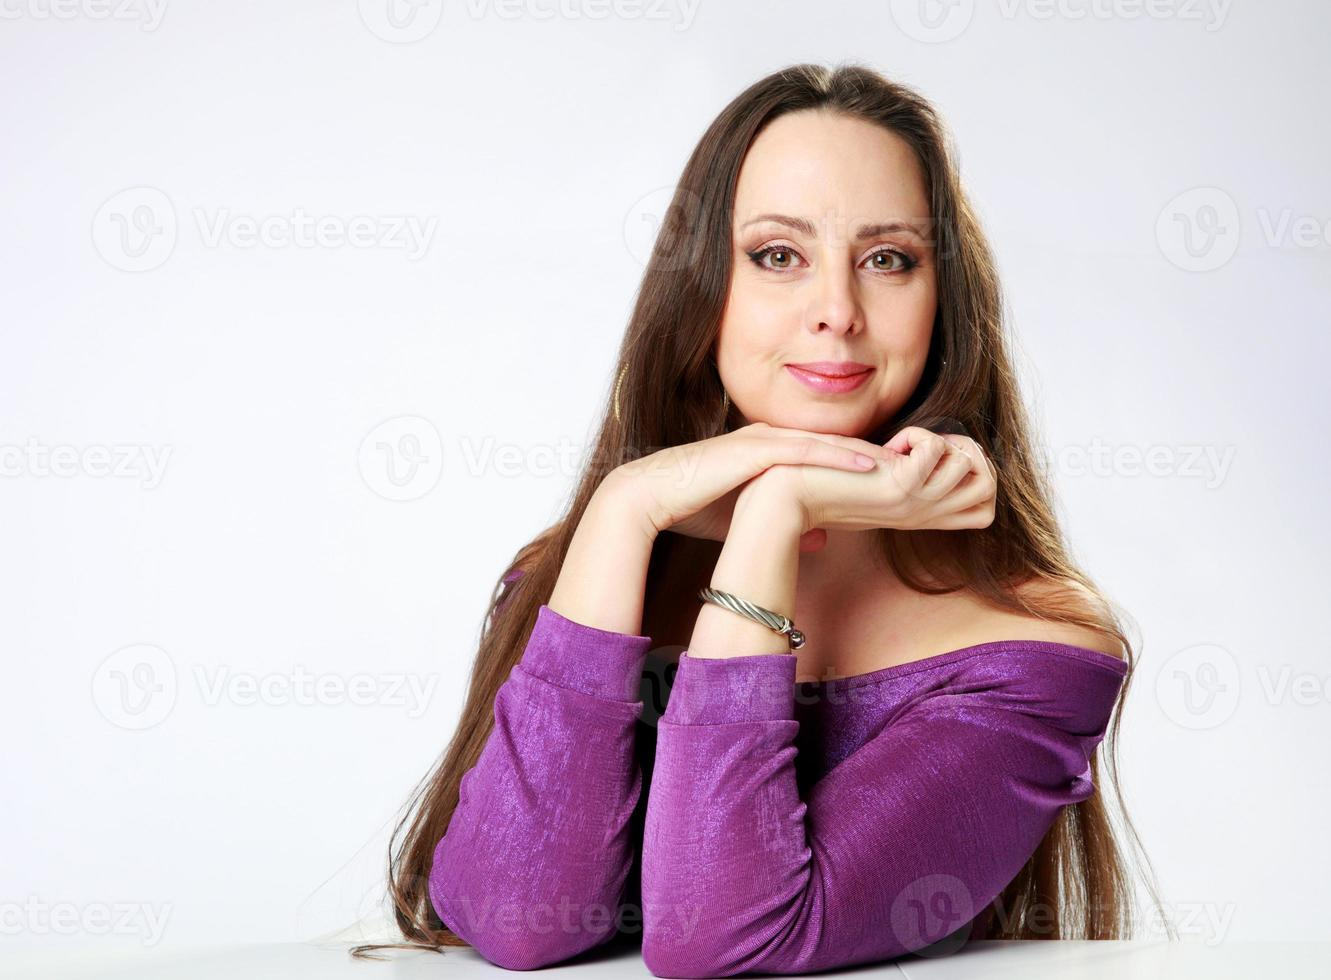 portret van een glimlachende vrouw foto